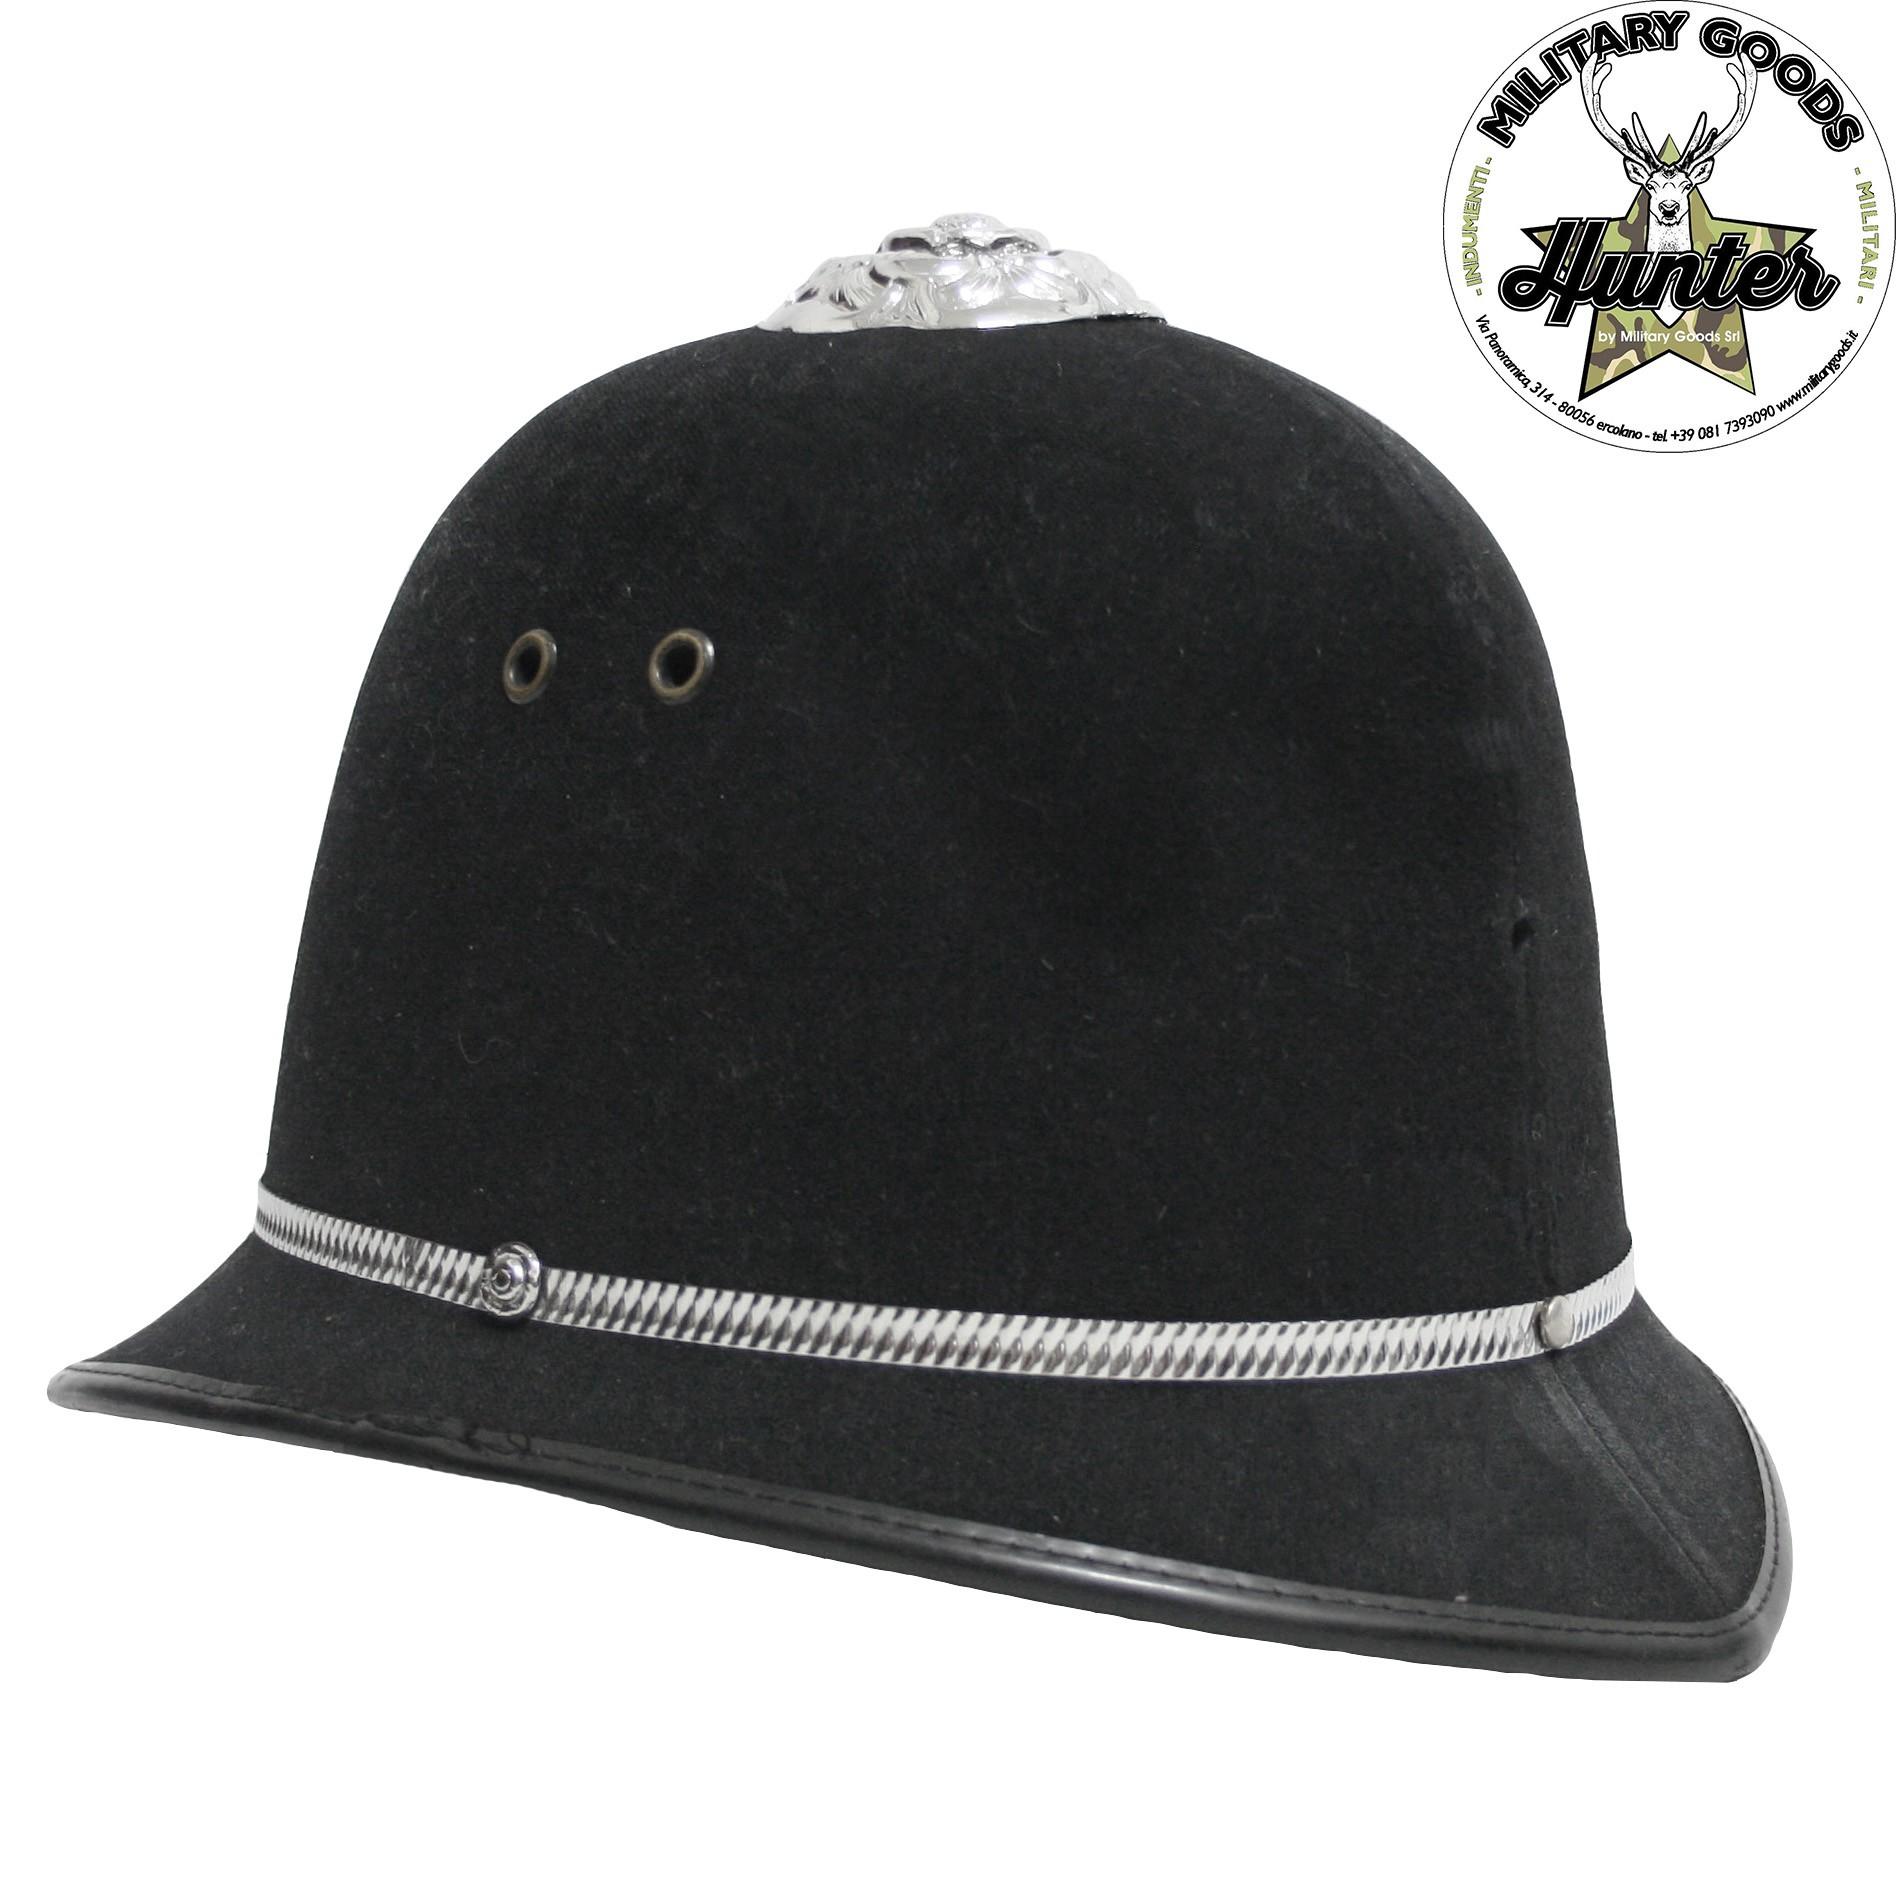 police bobby hat 3de01a1d14e7